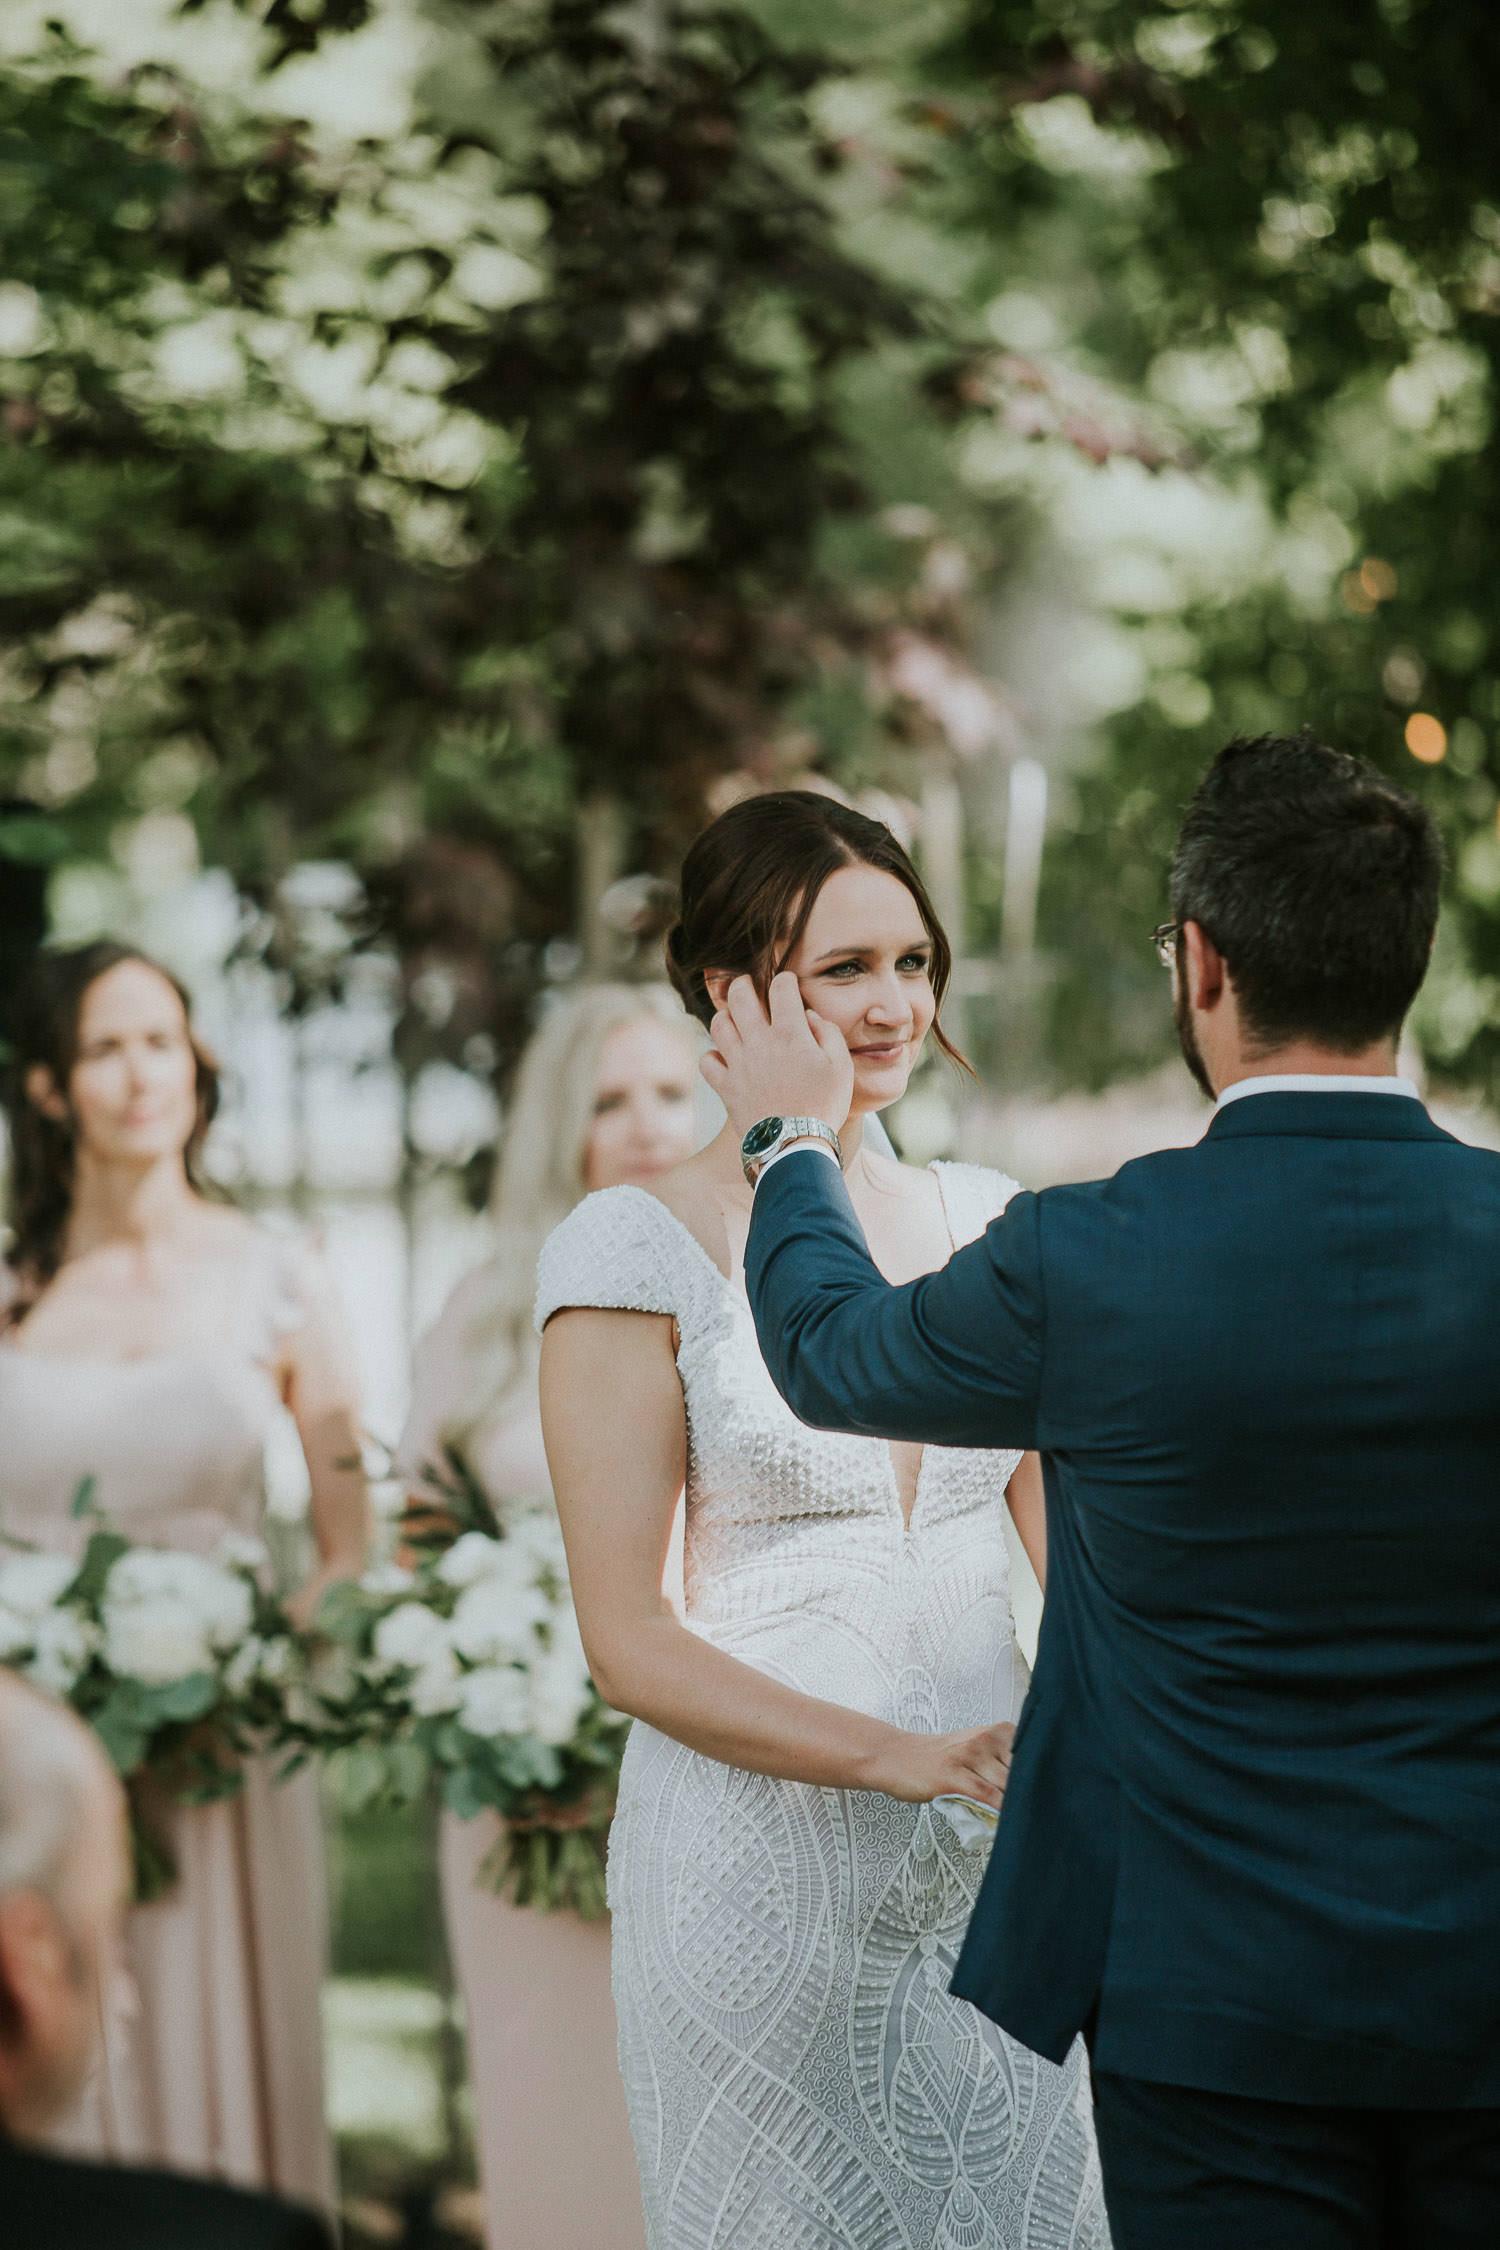 summer-backyard-wedding-in-alberta-sarah-pukin-0090